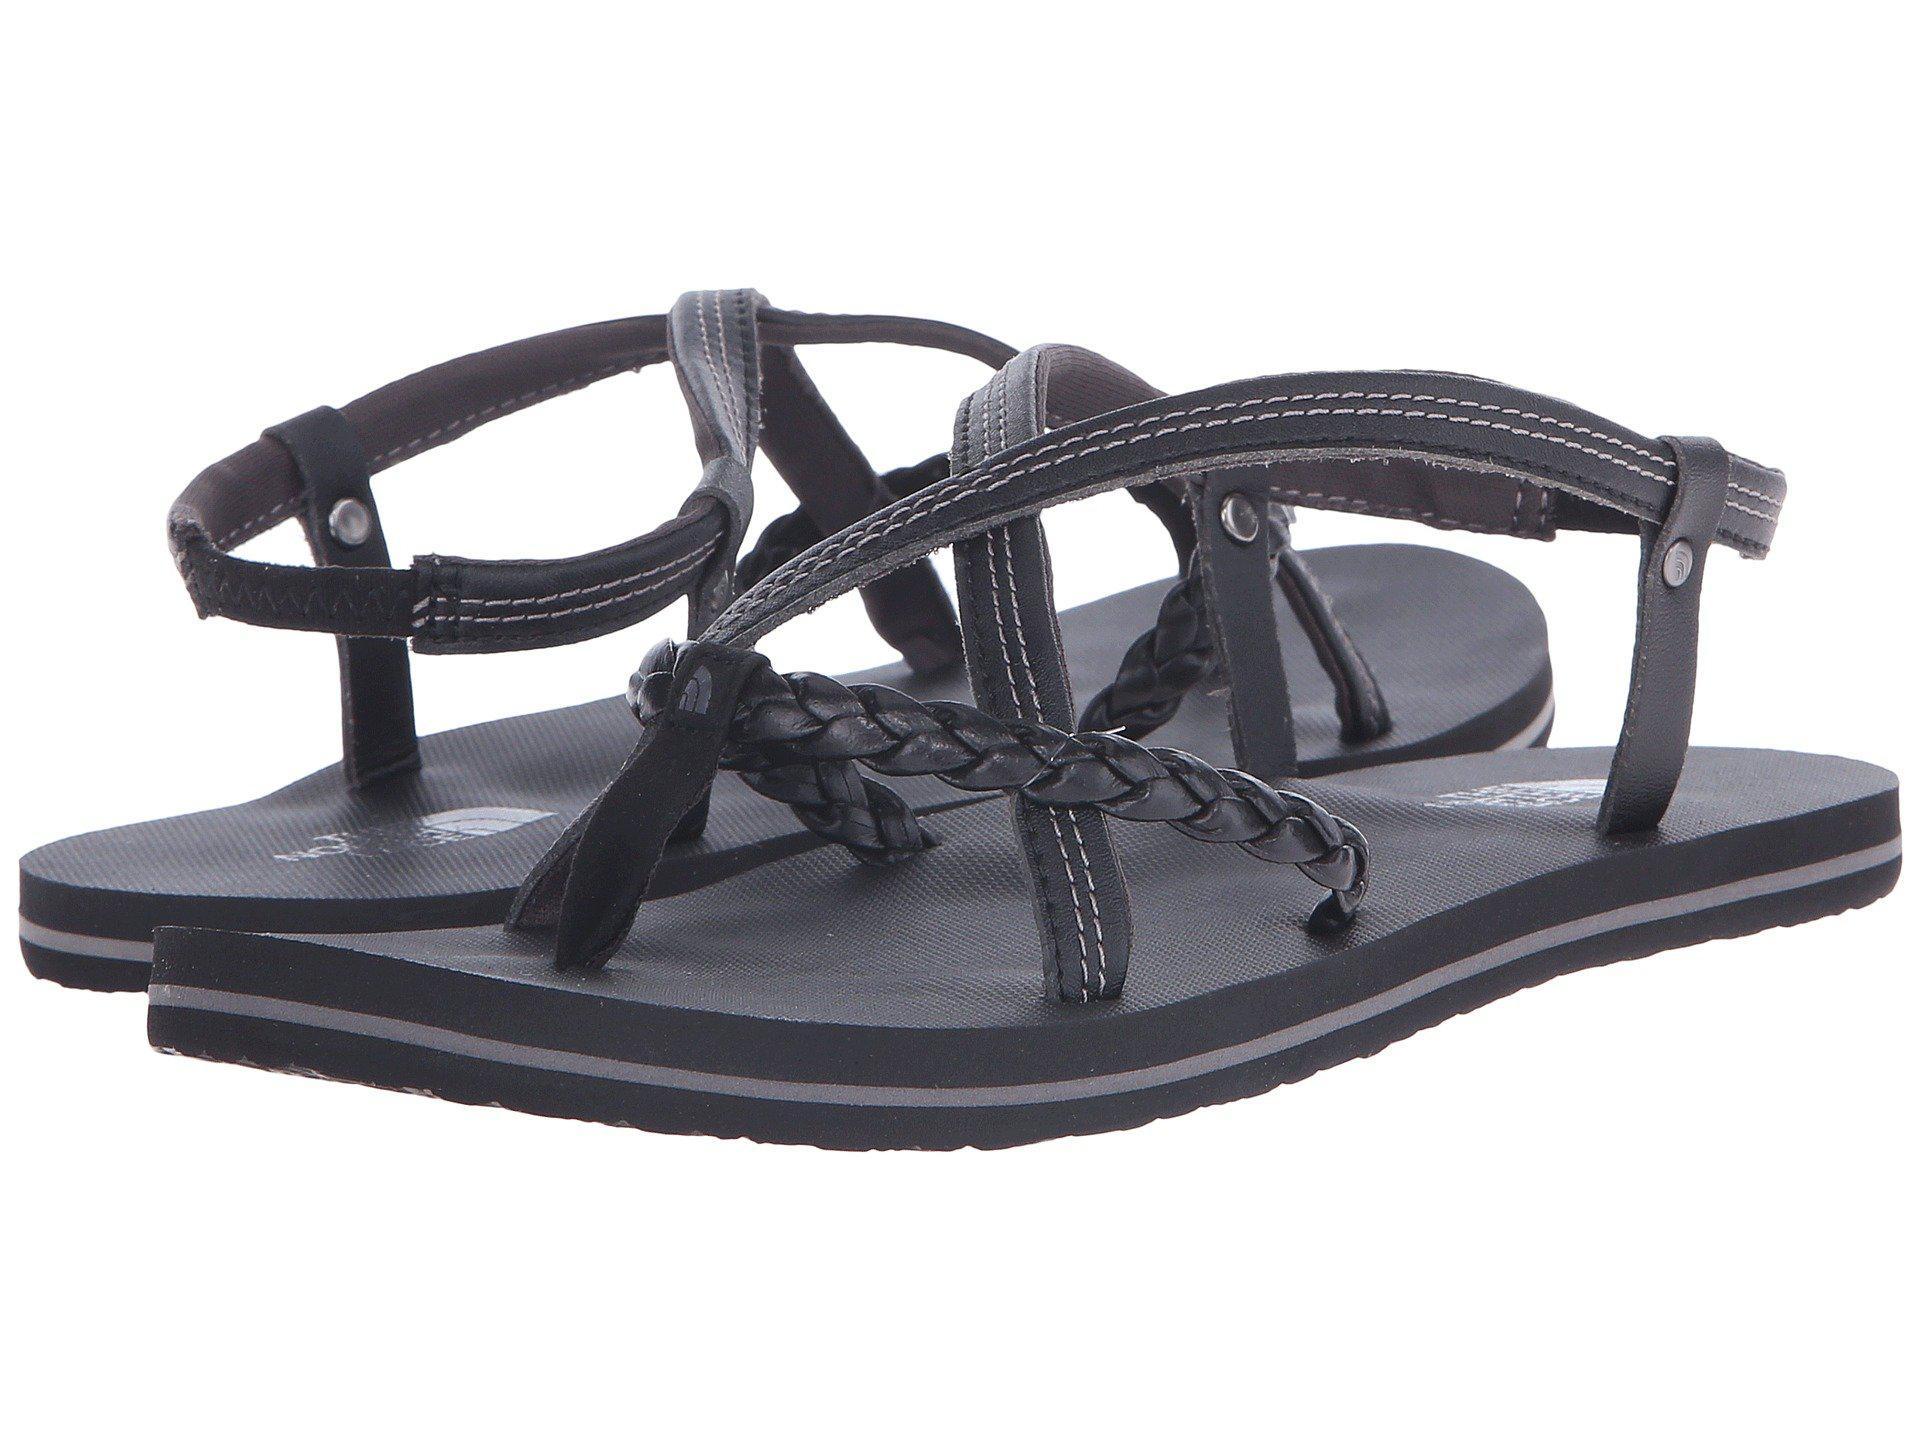 cab33d83a Base Camp Plus Gladi (tnf Black/dark Gull Gray (prior Season)) Women's  Sandals